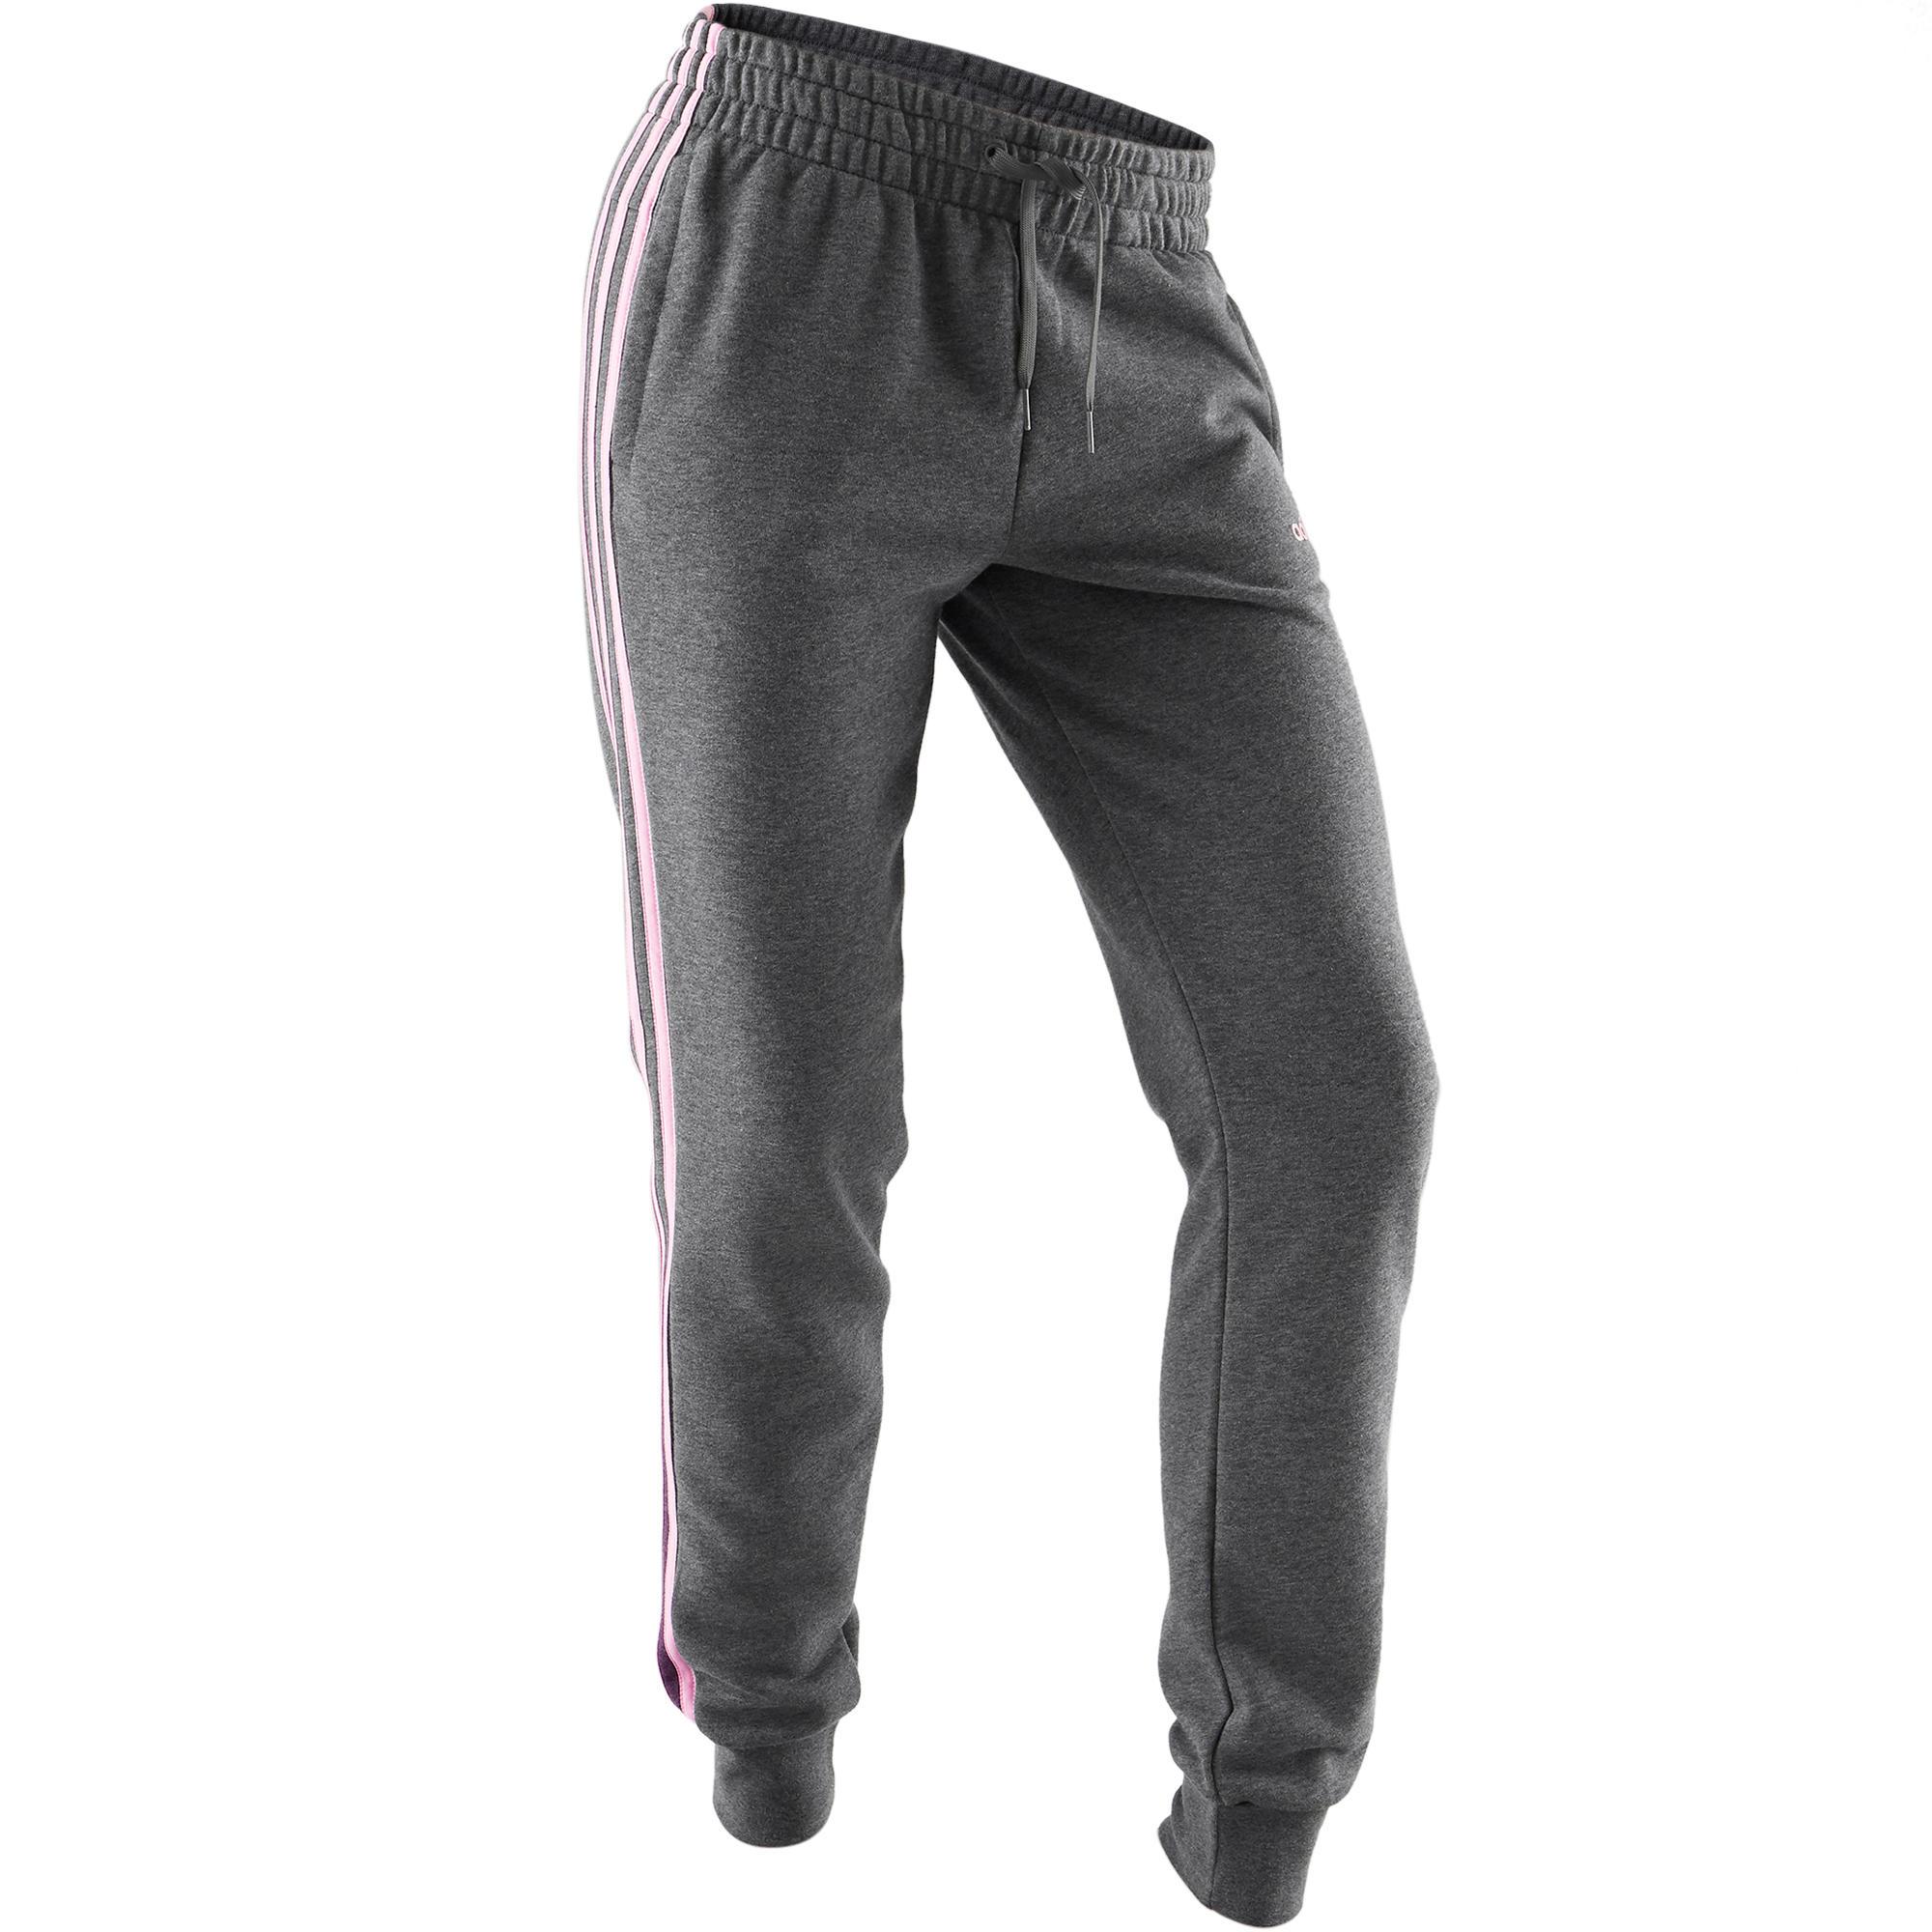 Pantalones Adidas - Decathlon 6b251fc128b82